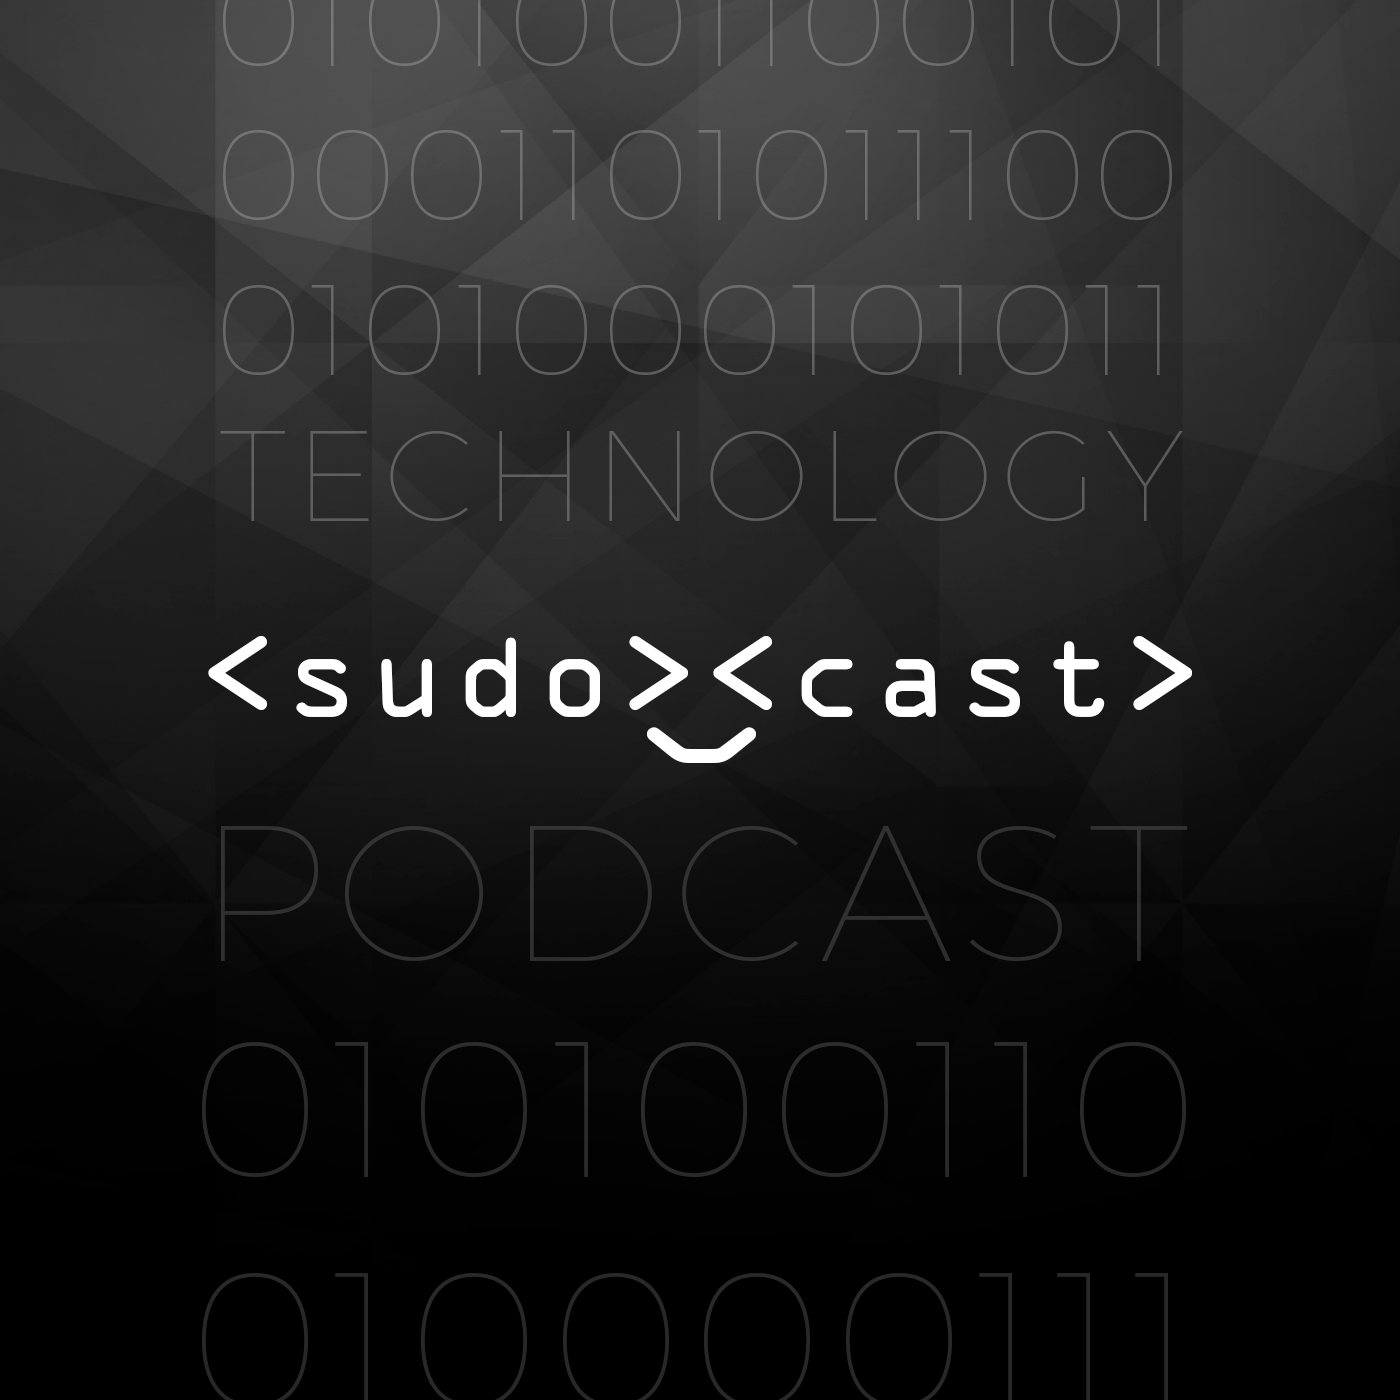 SudoCast